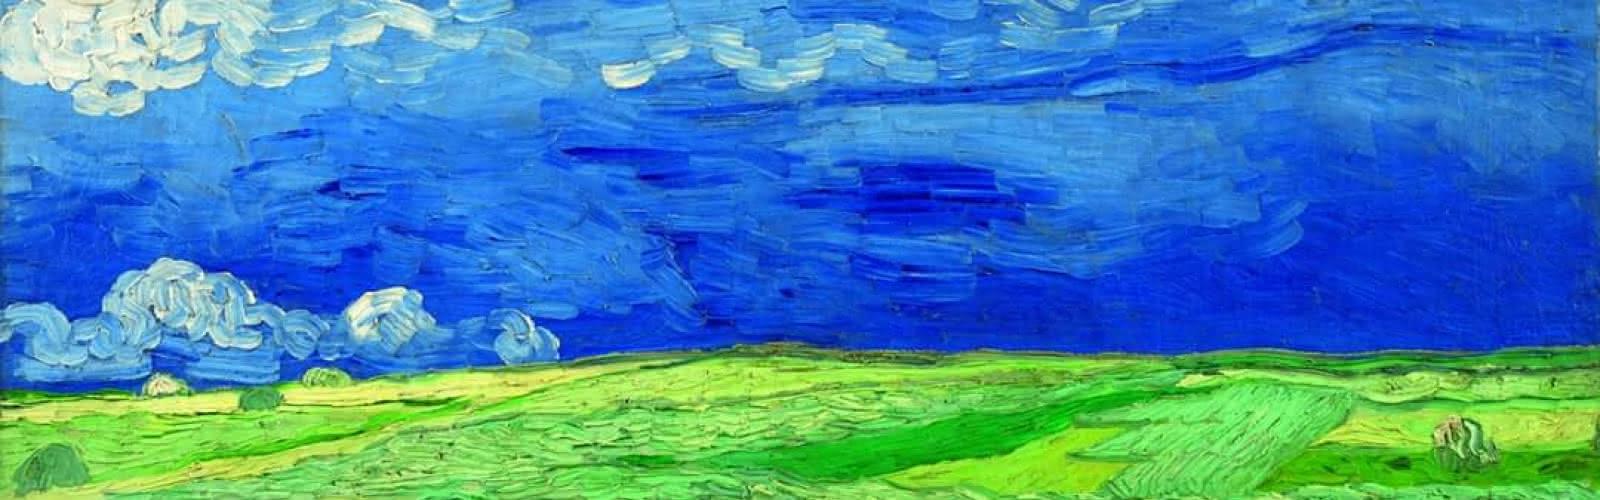 Peinture impressionniste